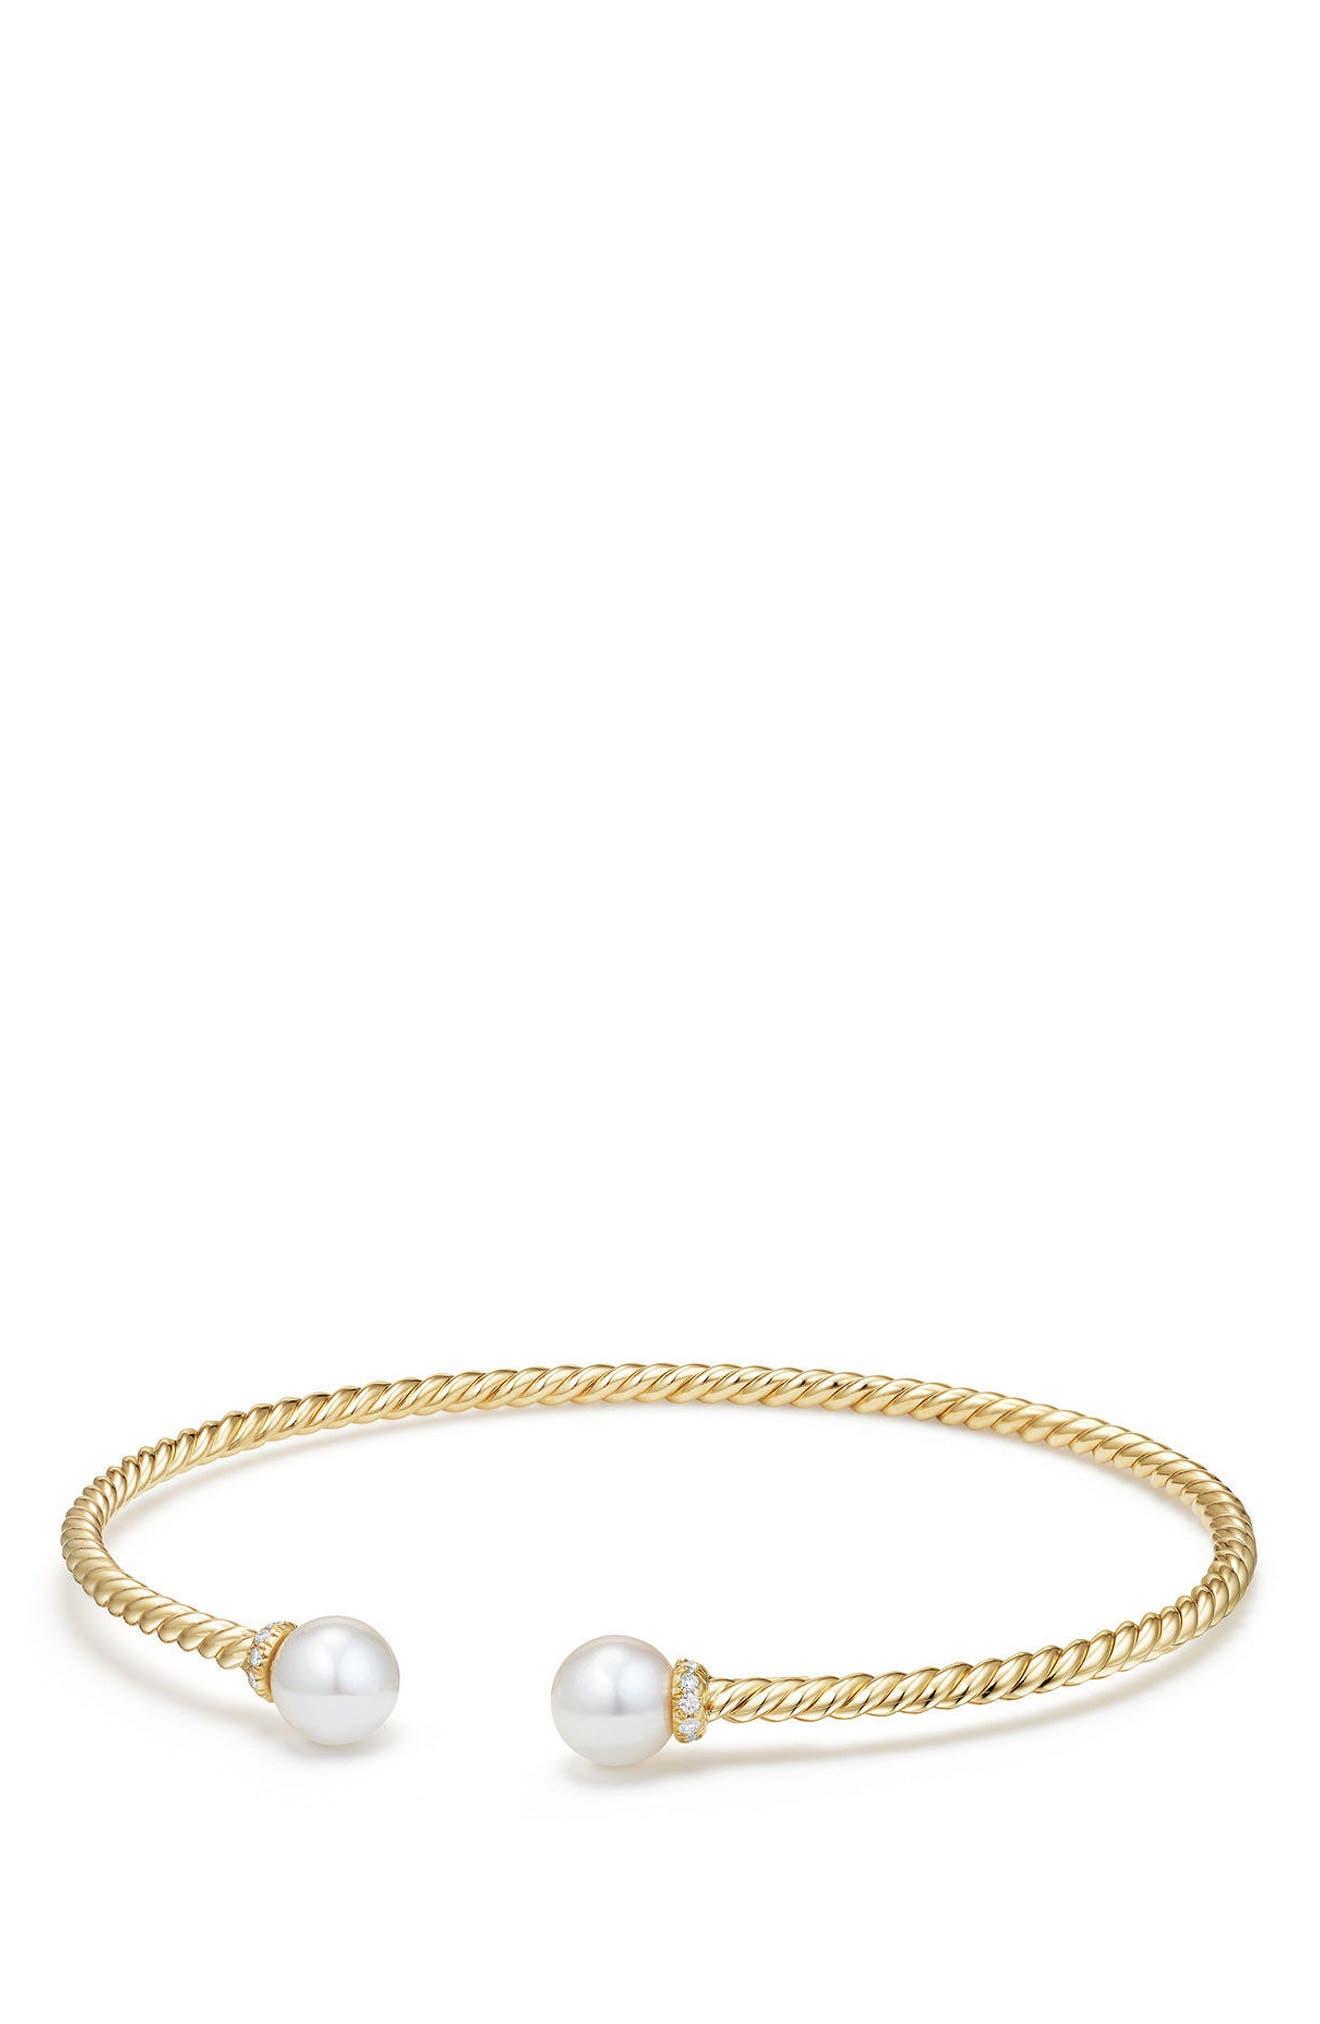 Solari Pearl Bracelet with Diamonds in 18K Gold,                         Main,                         color, Yellow Gold/ Diamond